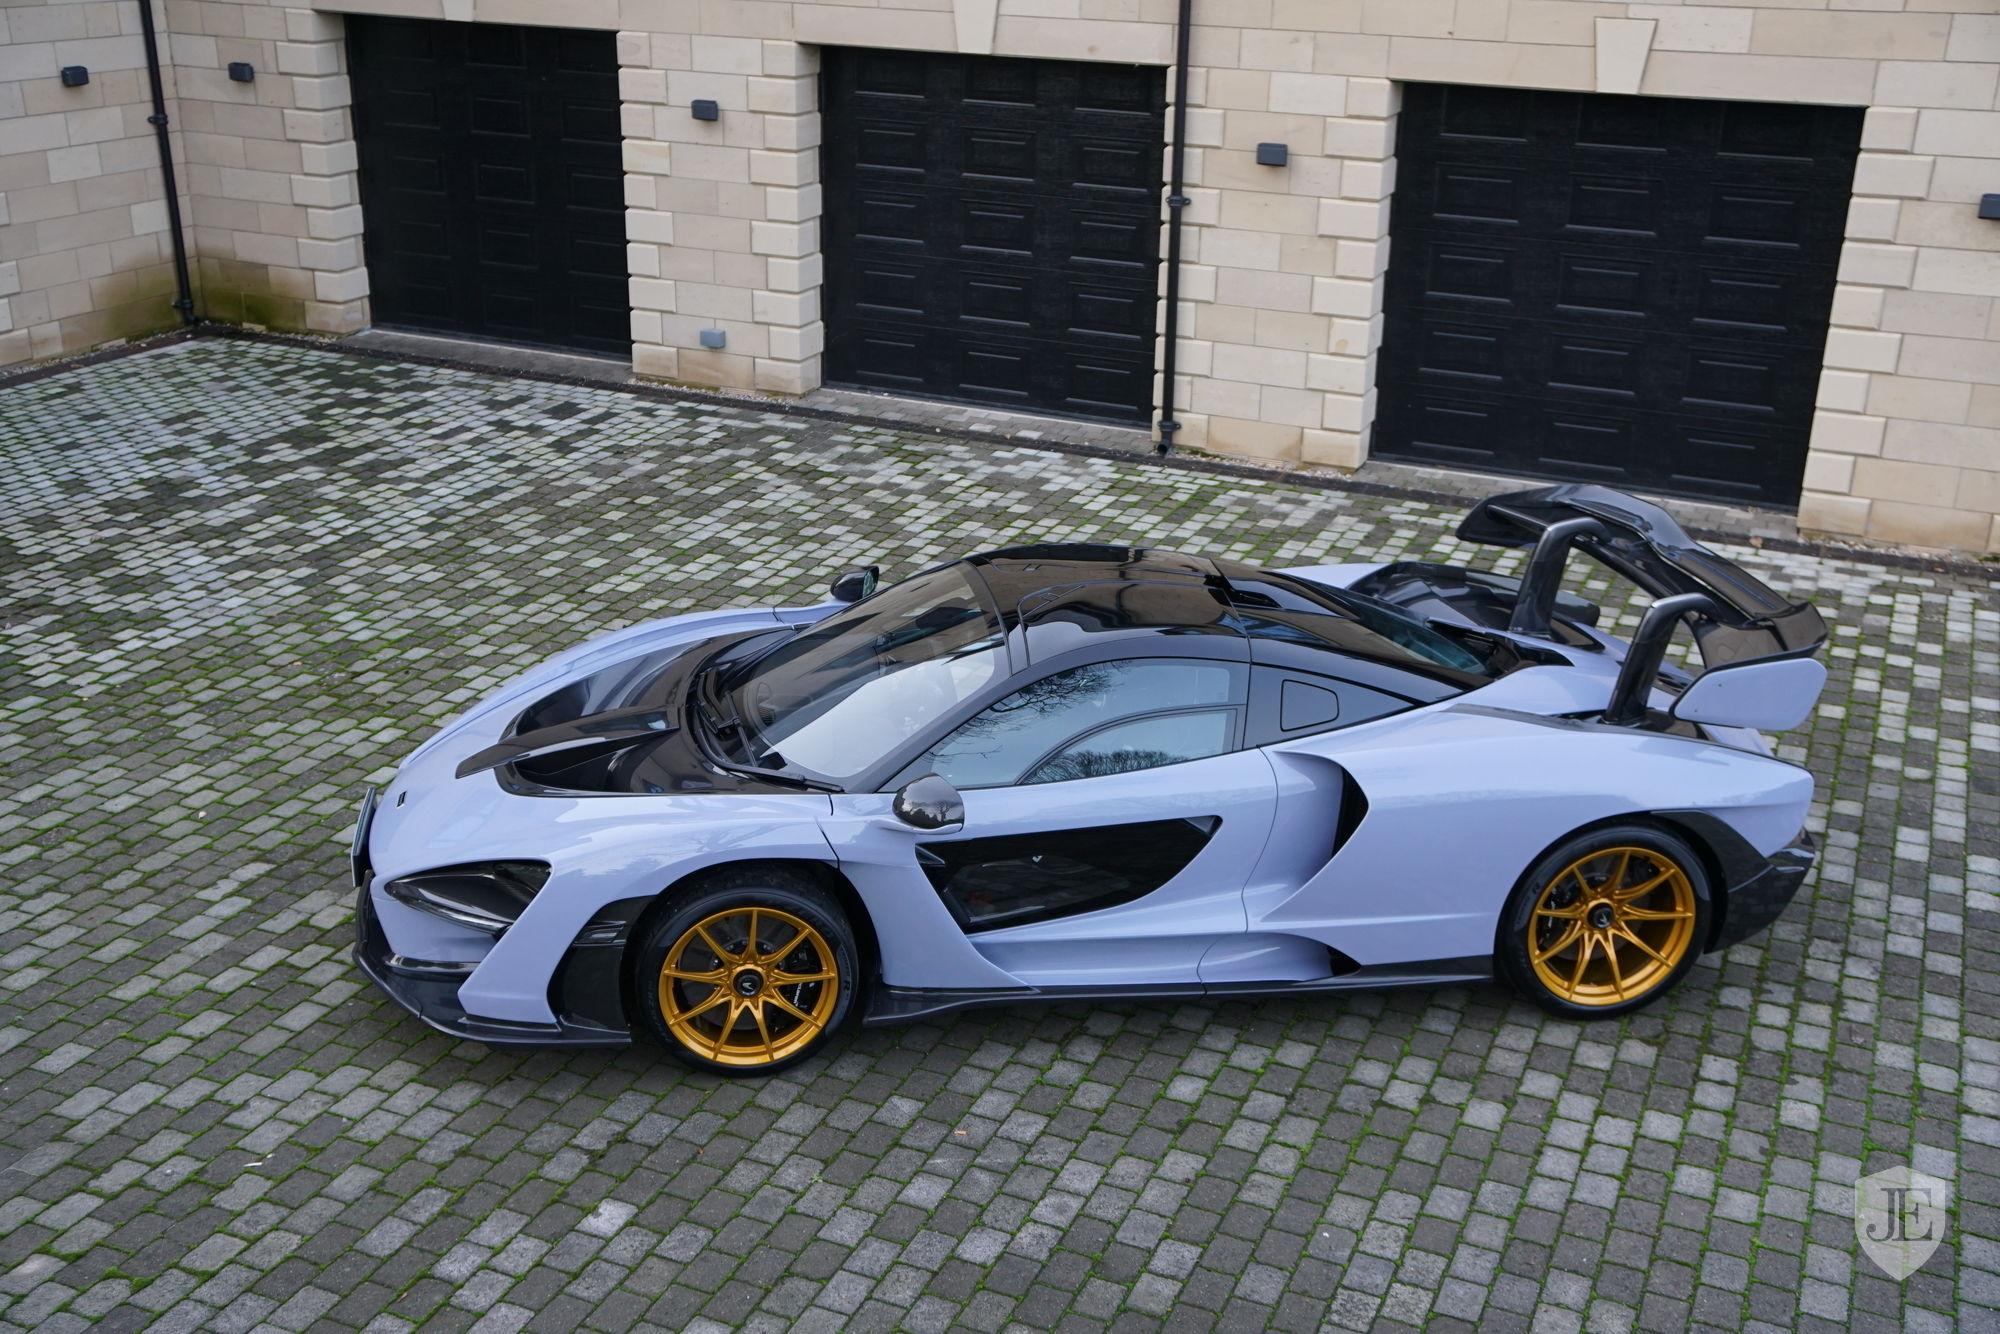 McLaren_Senna_for_sale_0005